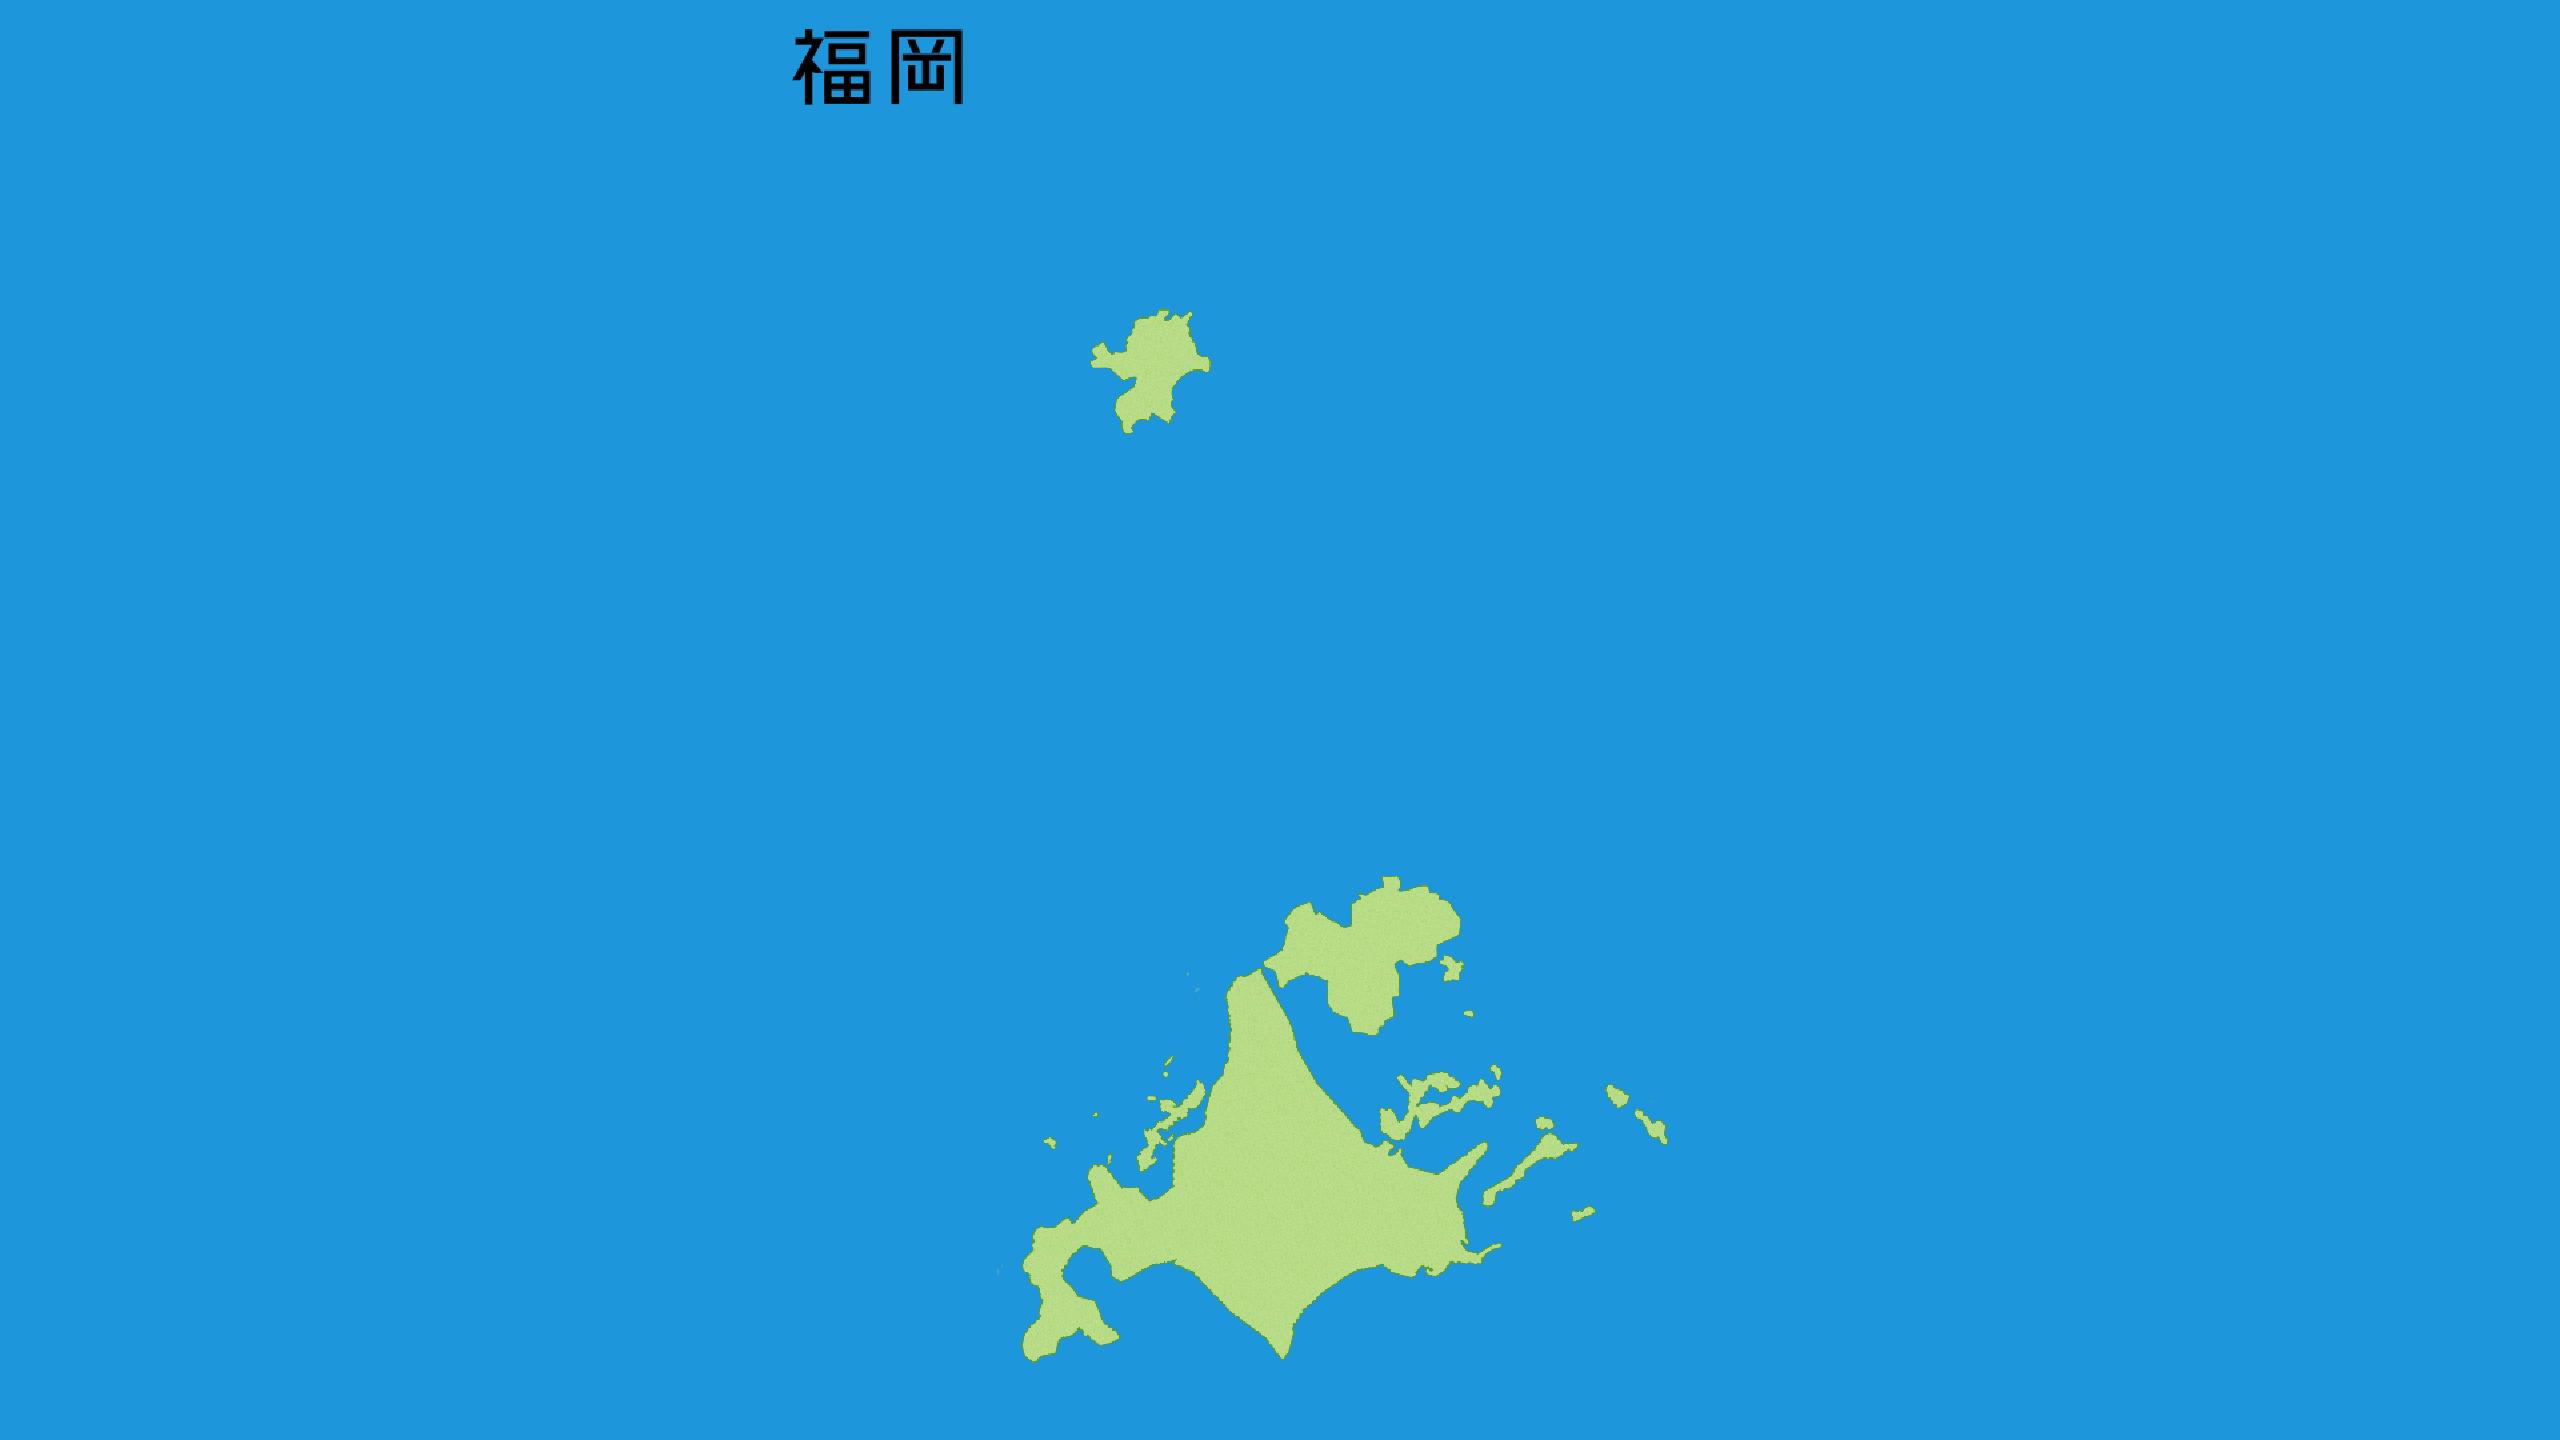 2017-11-04 (10)